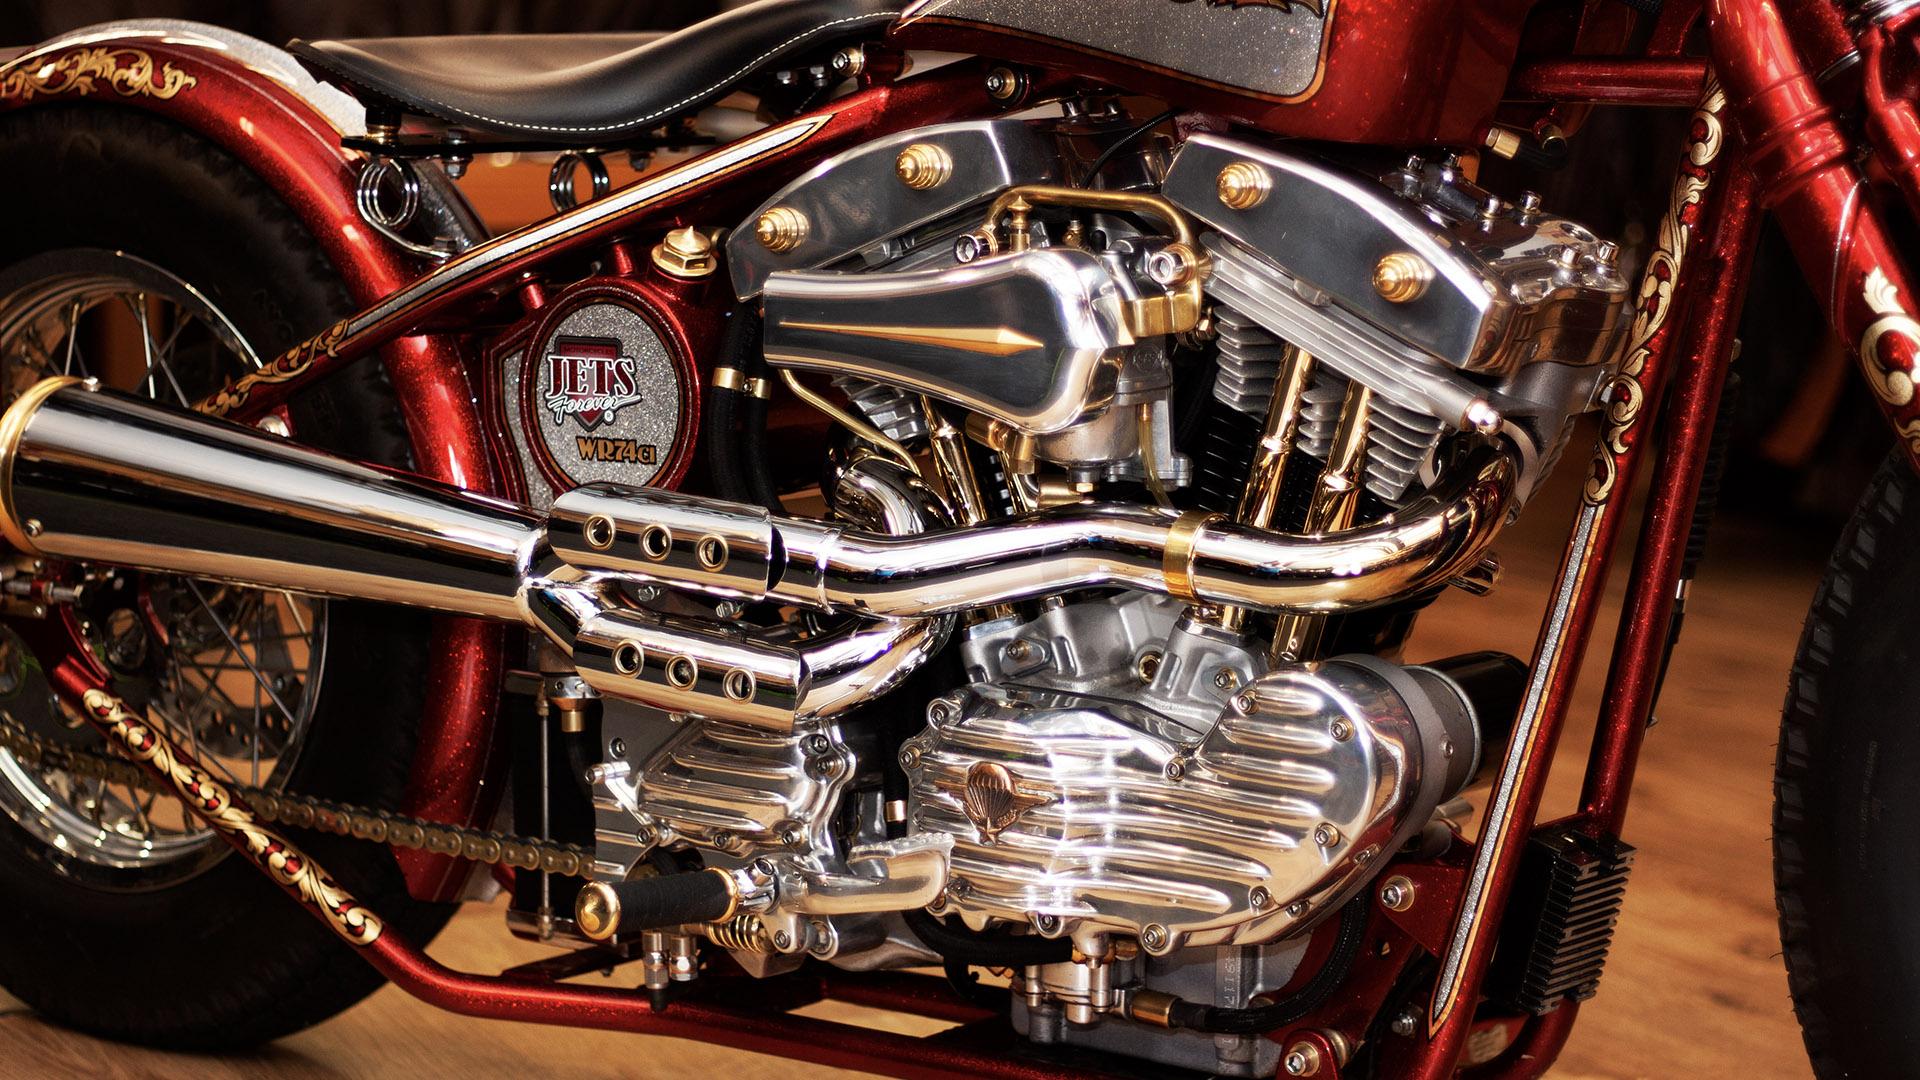 jetster engine